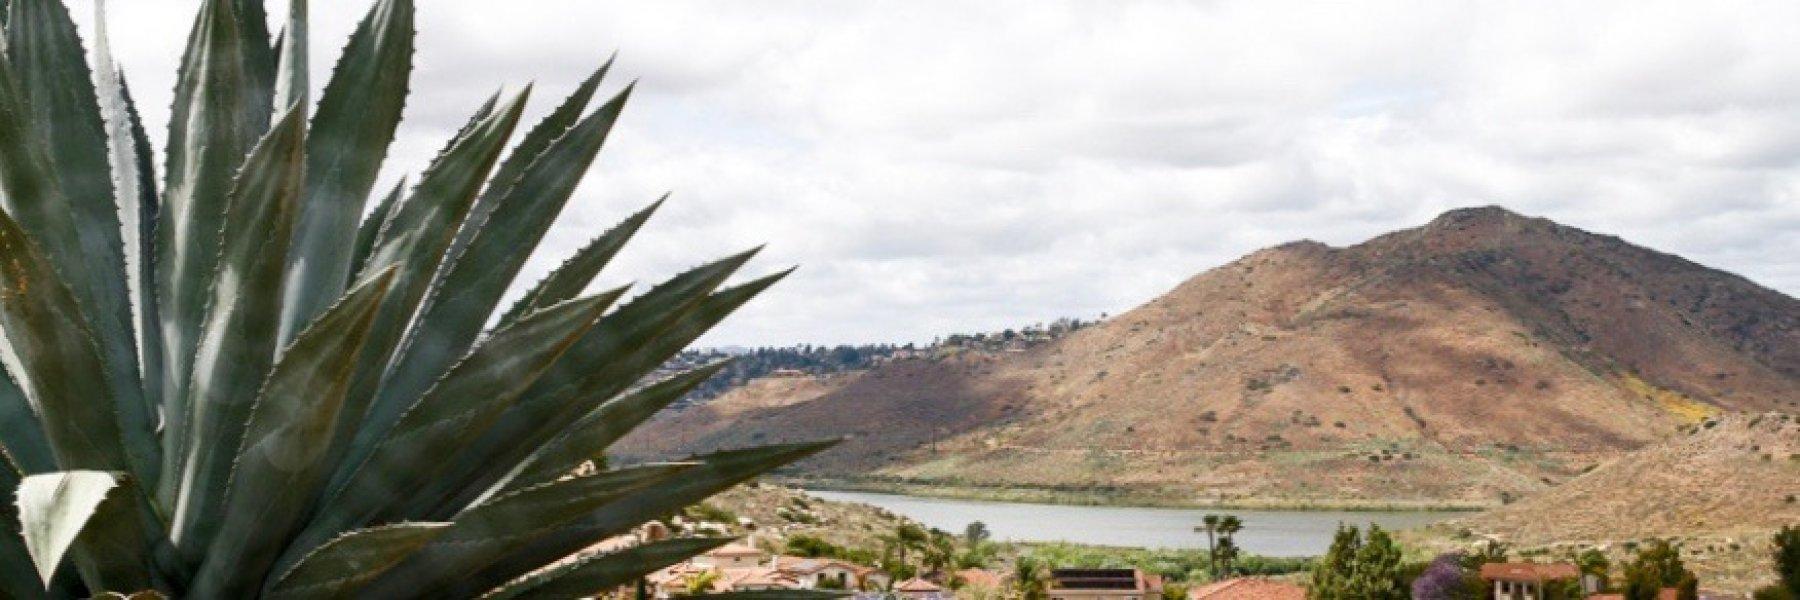 Westwood is a community of homes in Rancho Bernardo California